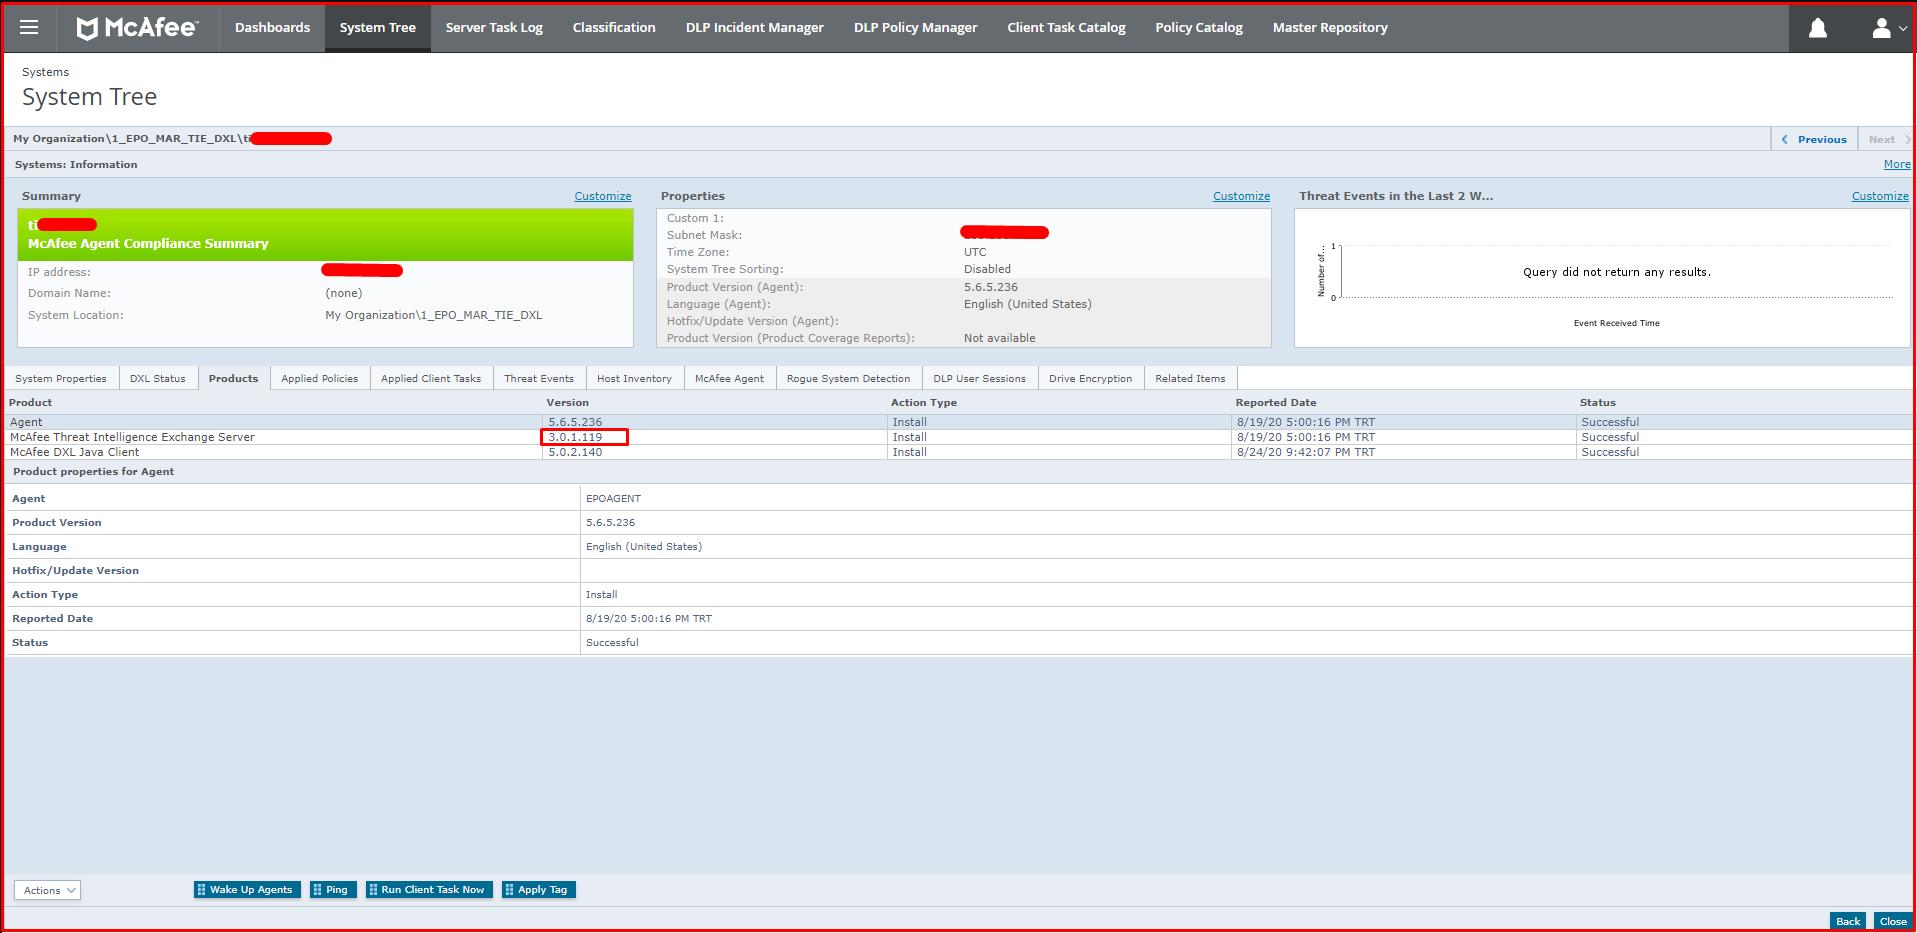 McAfee Threat Intelligence Exchange Server